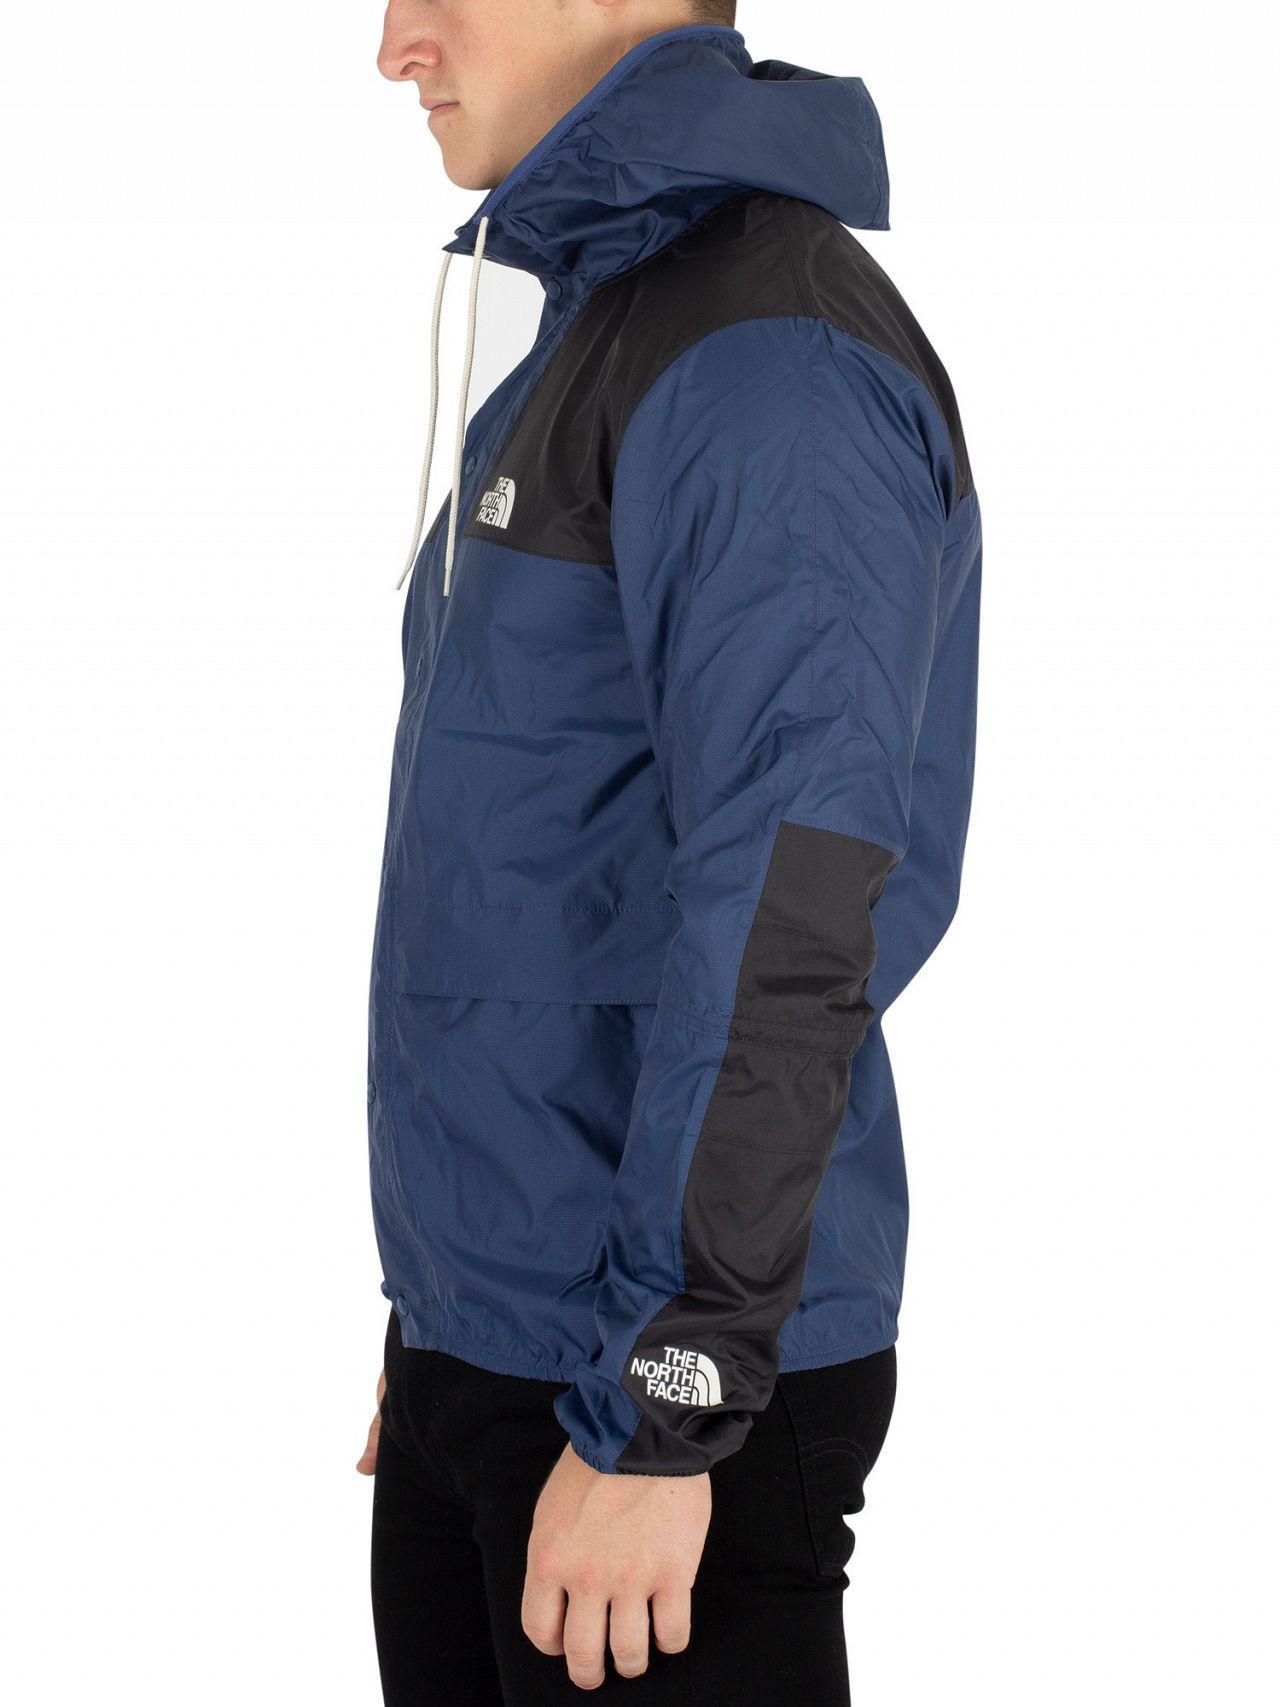 e8b4faeab The North Face Shady Blue 1985 Mountain Jacket for men